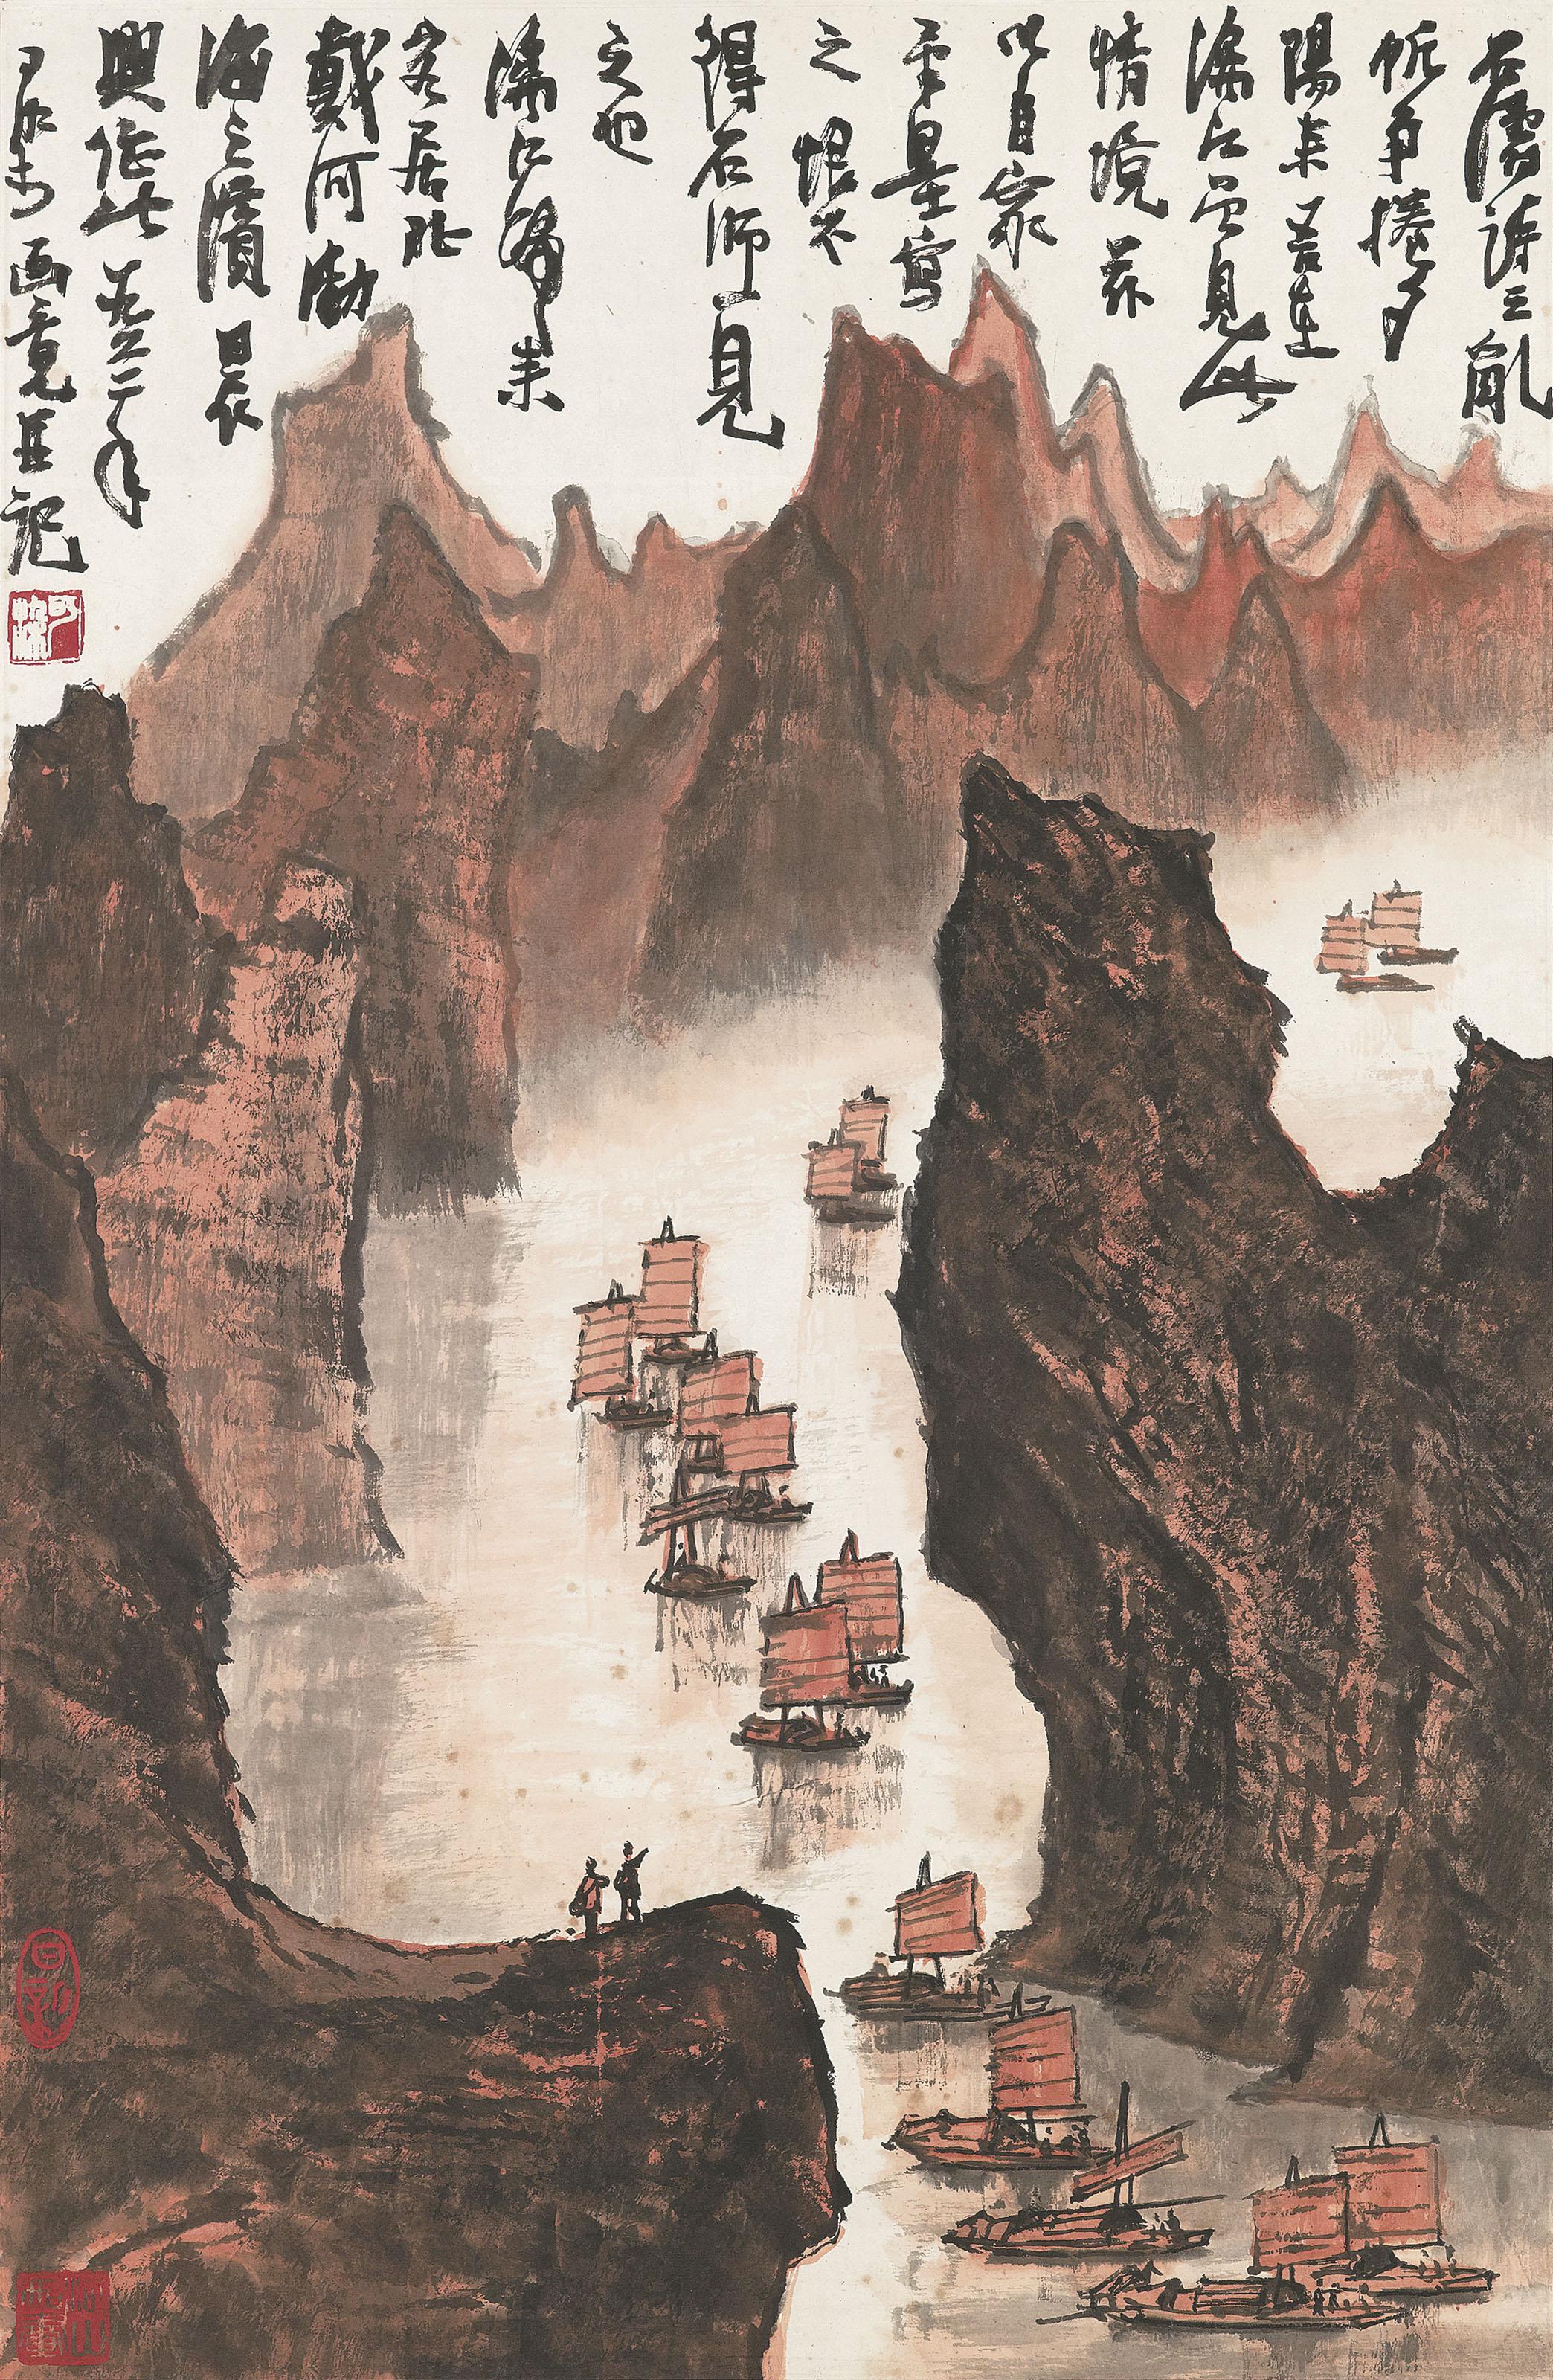 Sailing through the Autumn Rivers